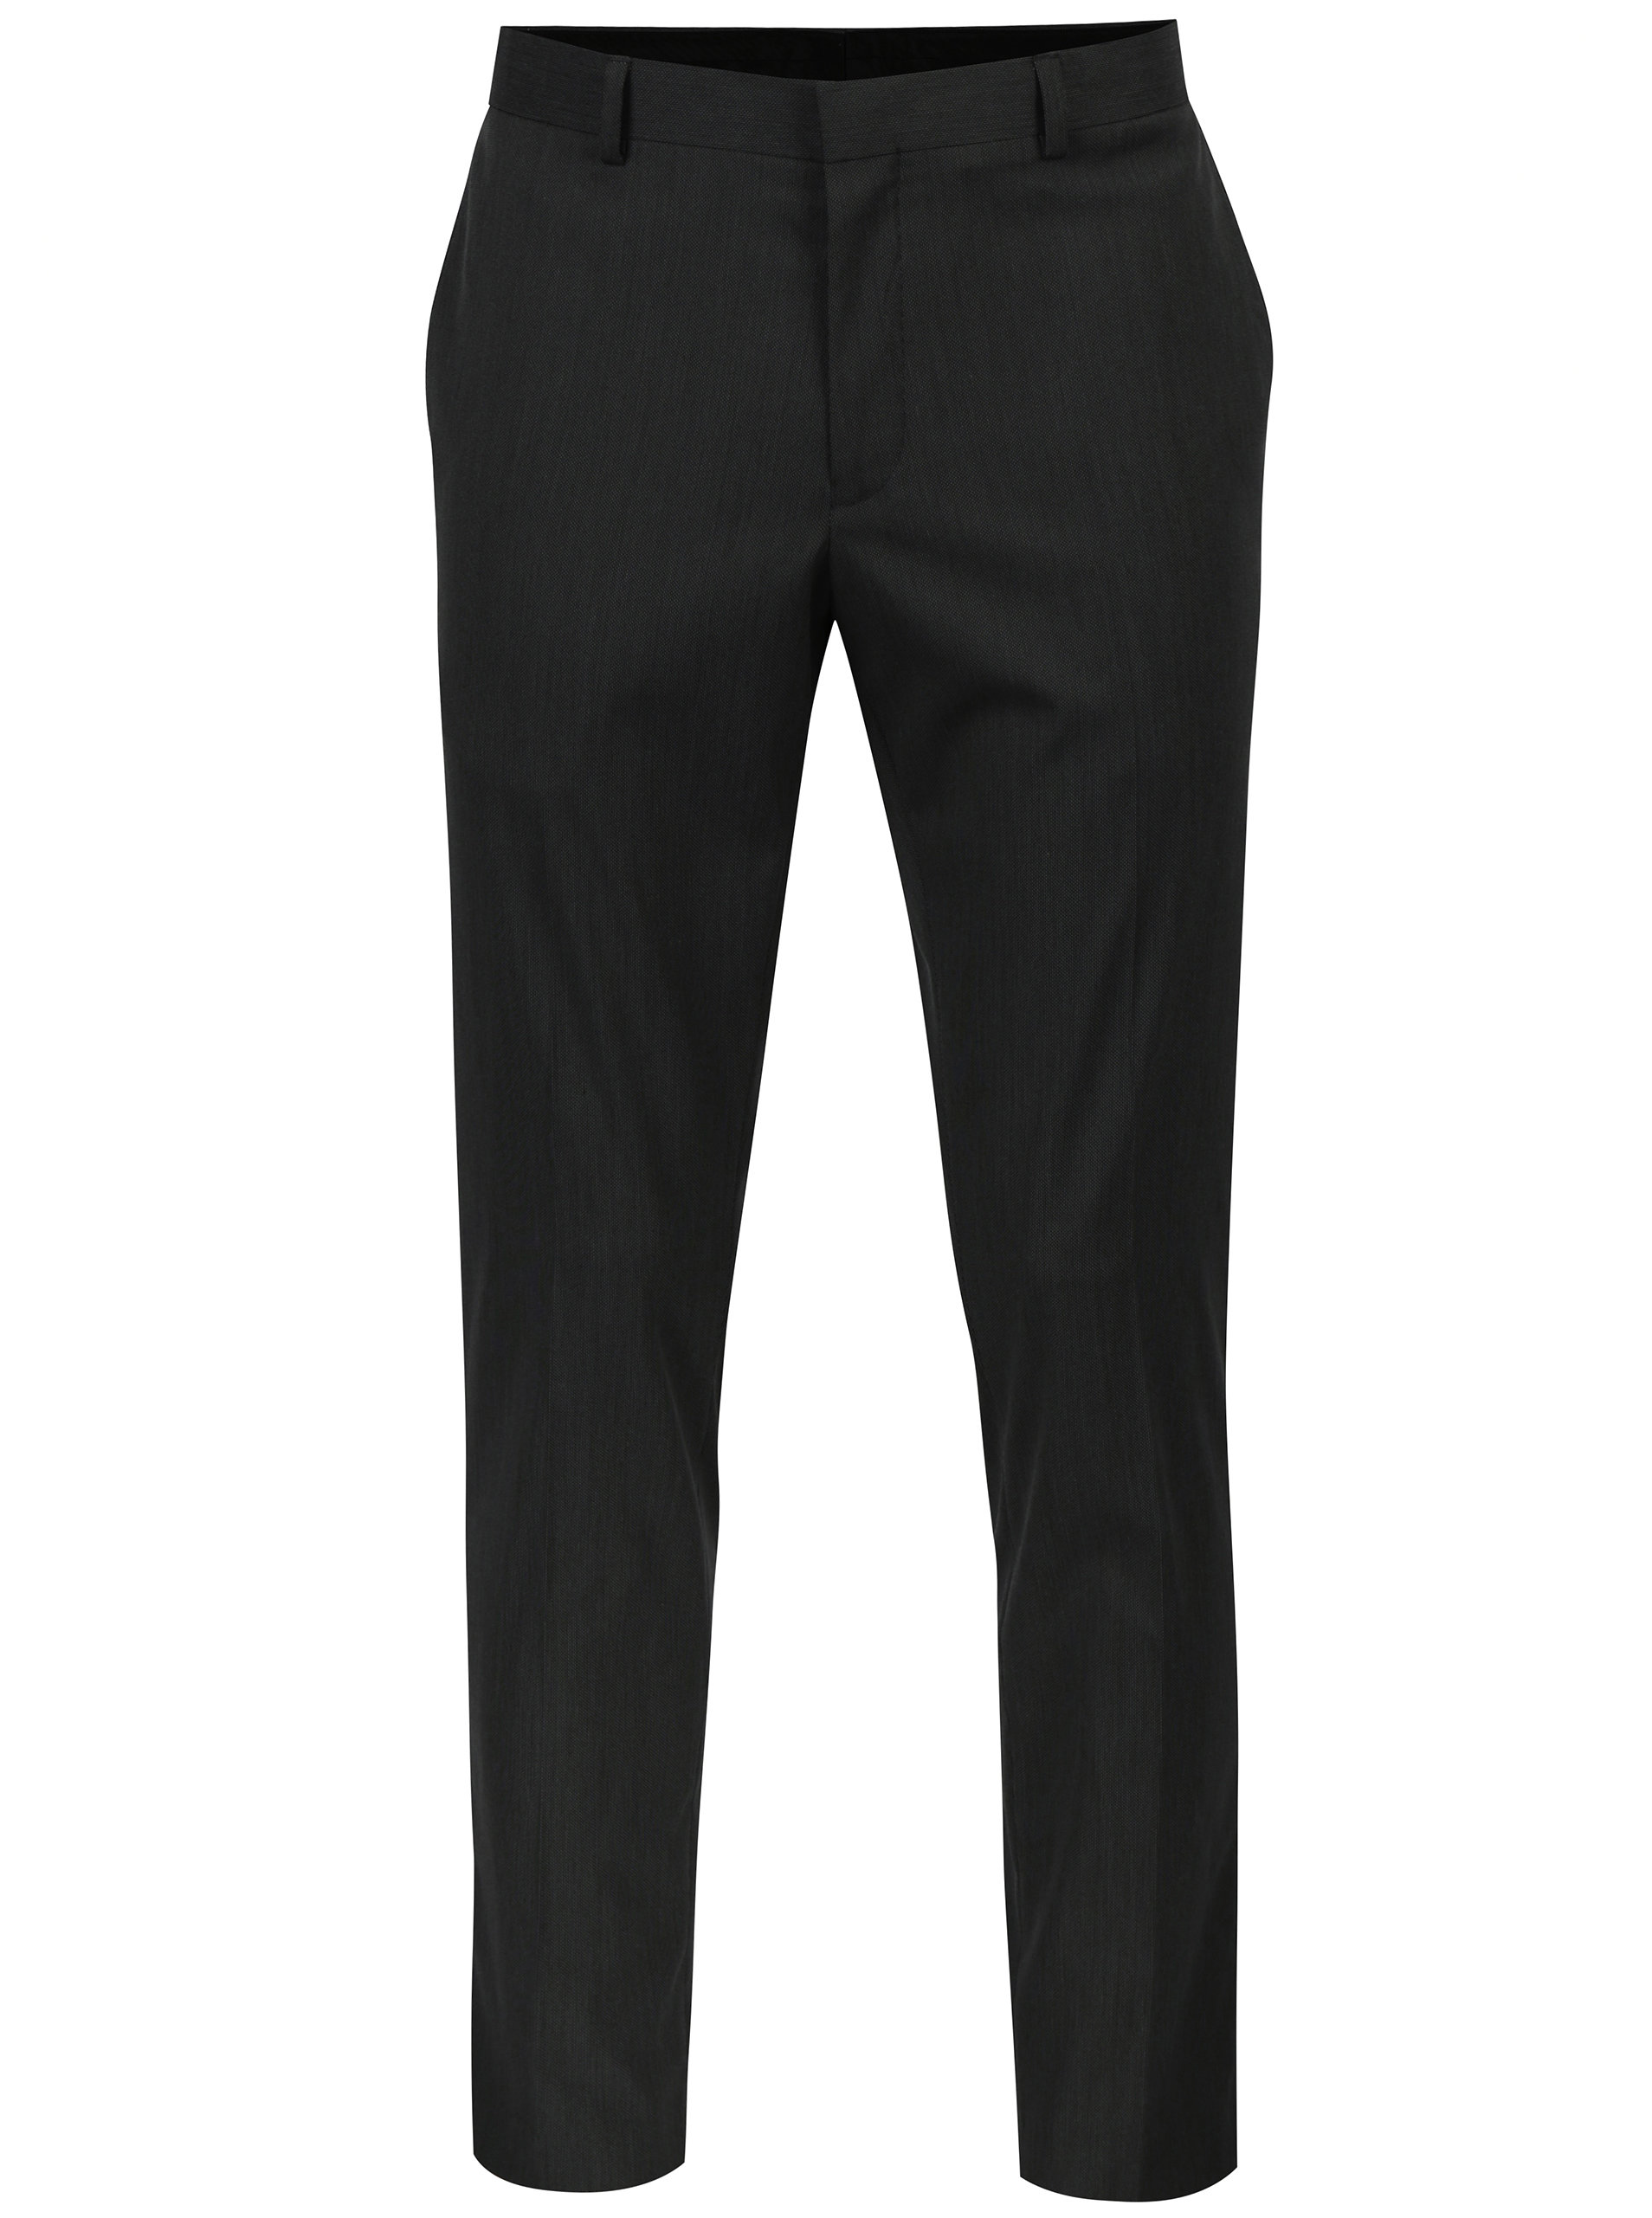 Šedé oblekové skinny kalhoty s jemným vzorem Burton Menswear London